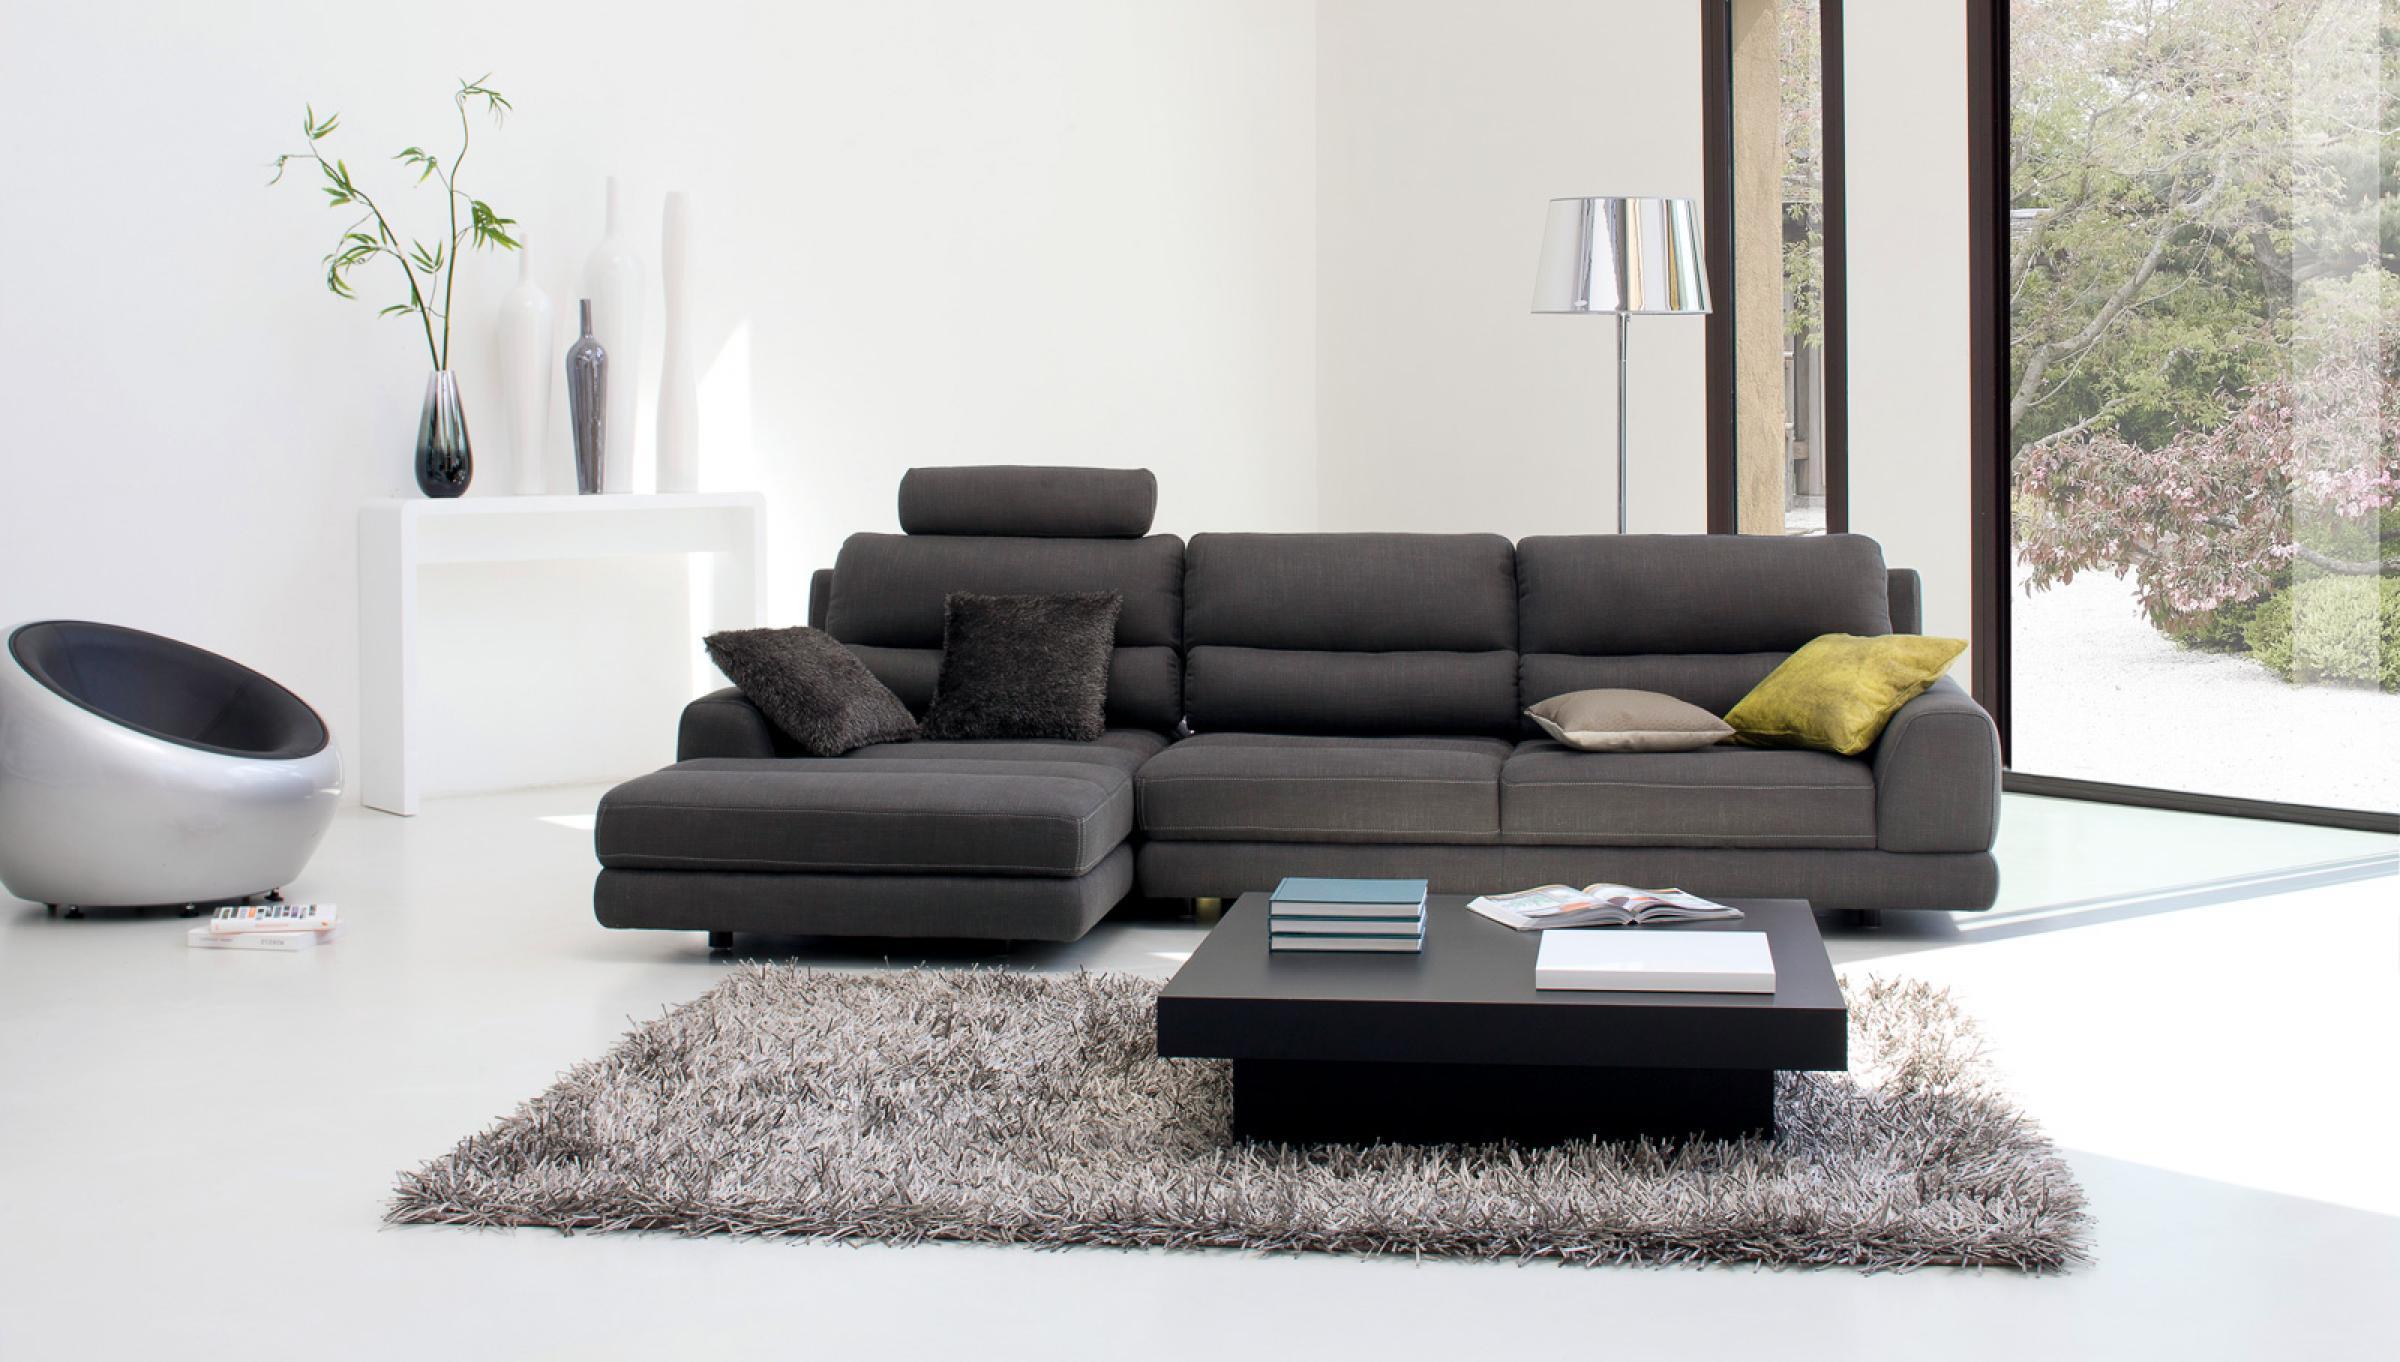 canape profond xxl. Black Bedroom Furniture Sets. Home Design Ideas